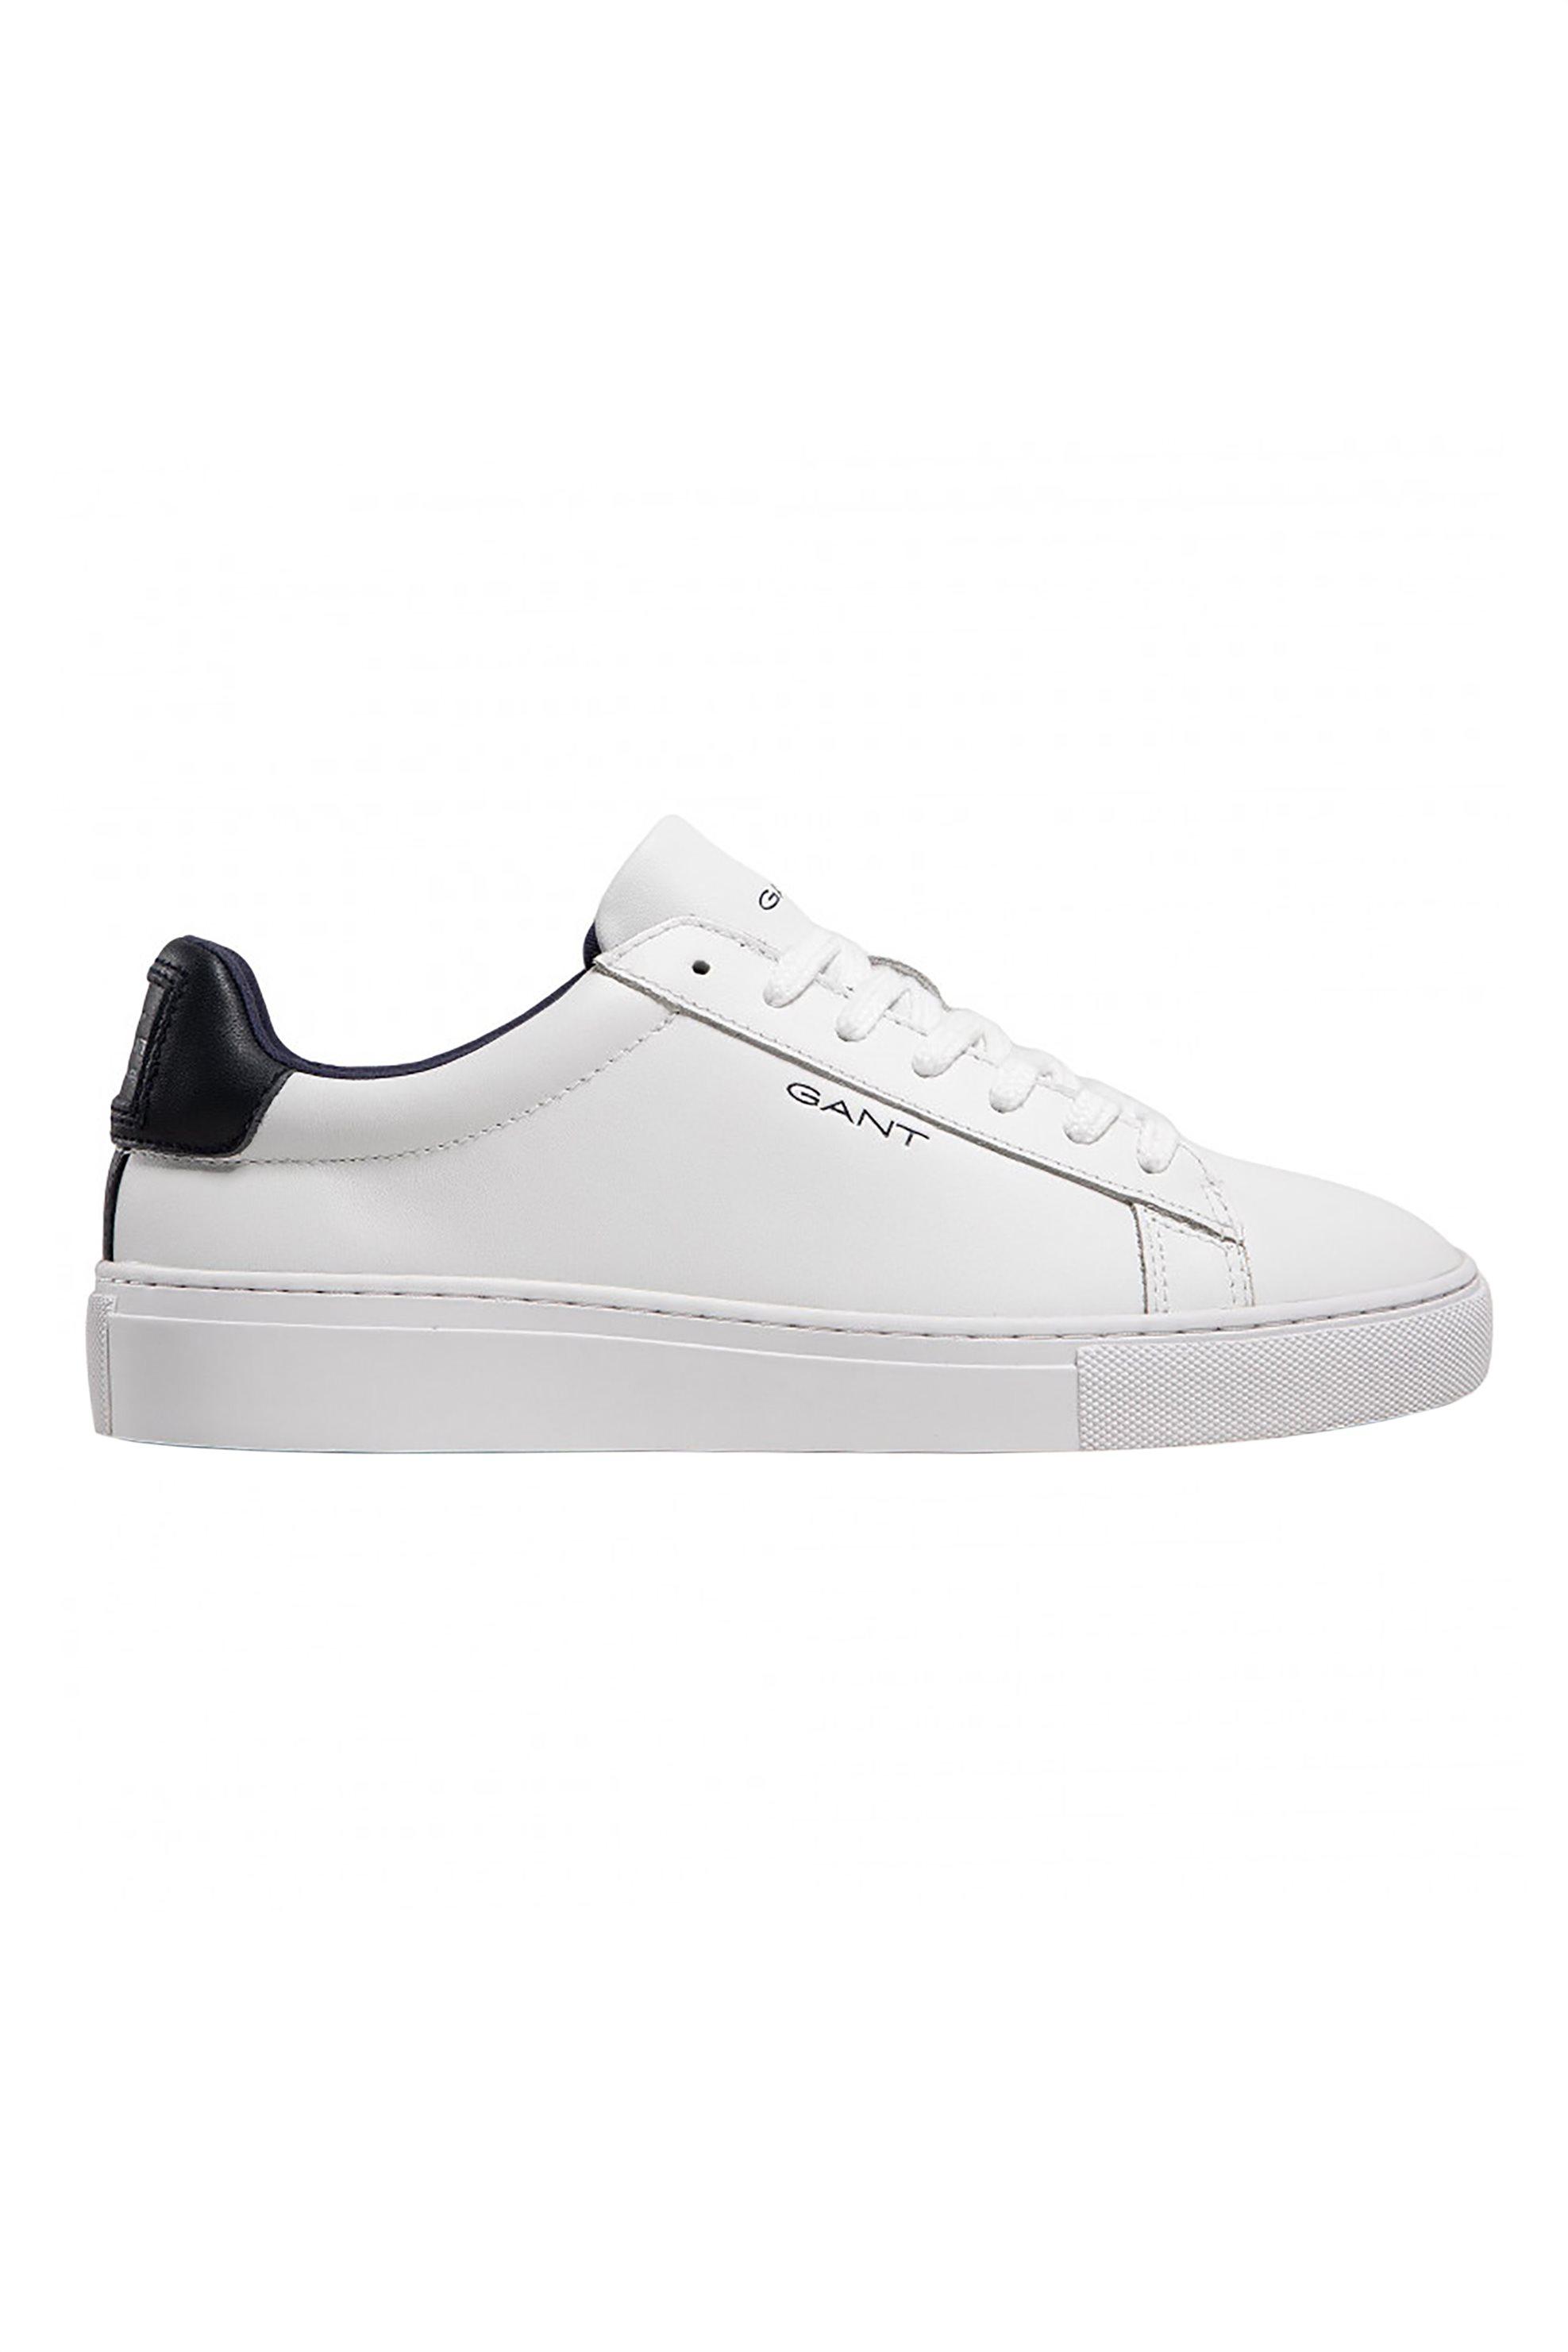 "Gant ανδρικά sneakers με logo print στο πλάι και contrast λεπτομέρειες ""Mc Julien"" – 22631654 – Μπλε Σκούρο"